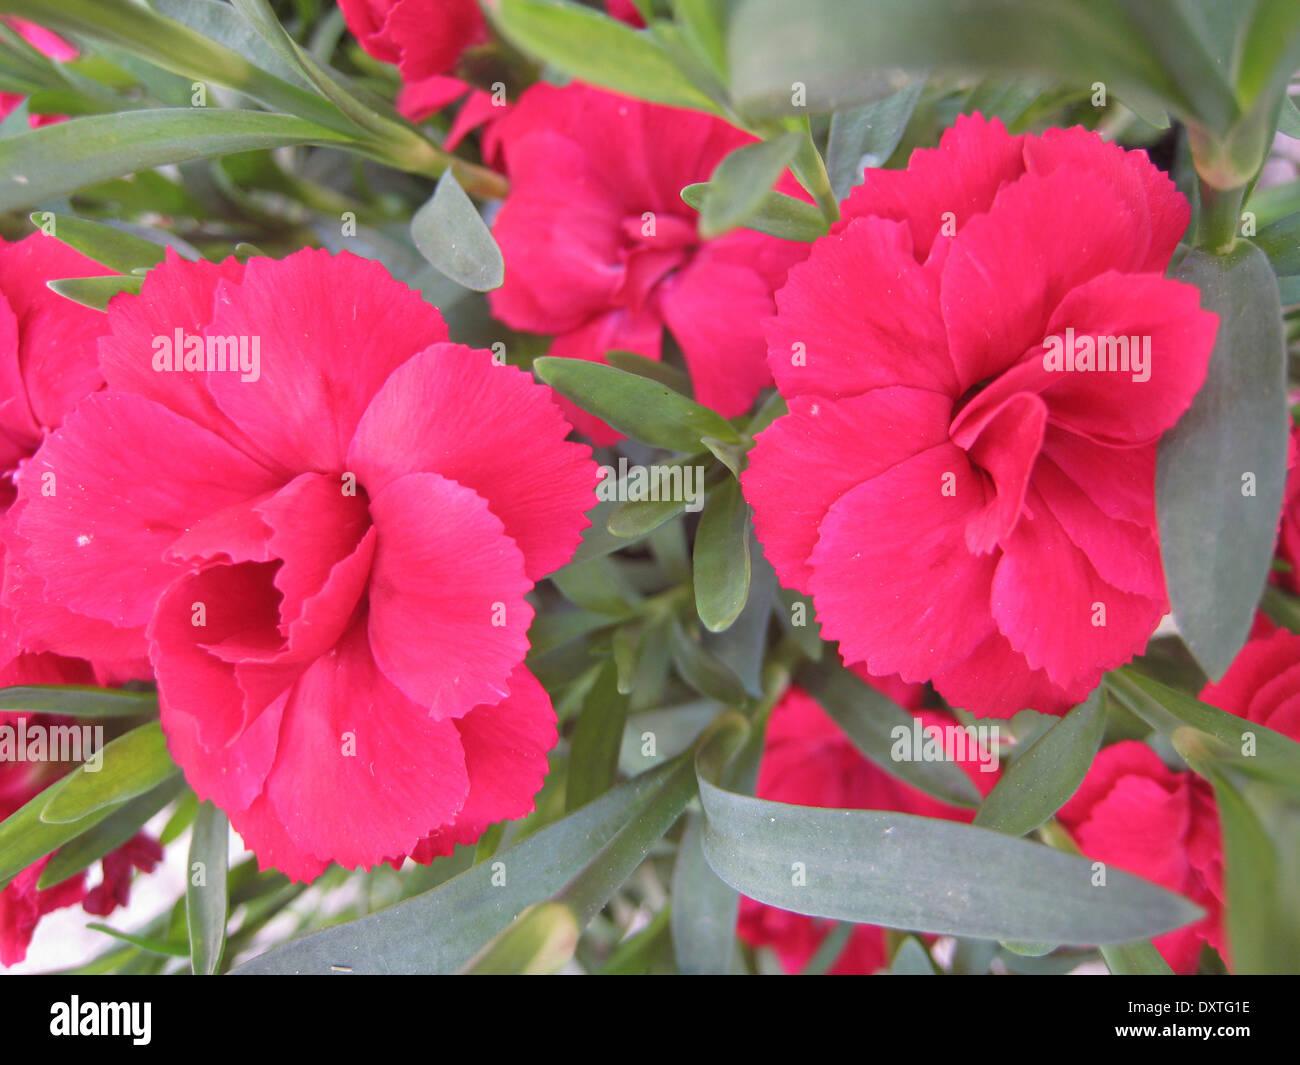 Red carnation (detail) - Stock Image